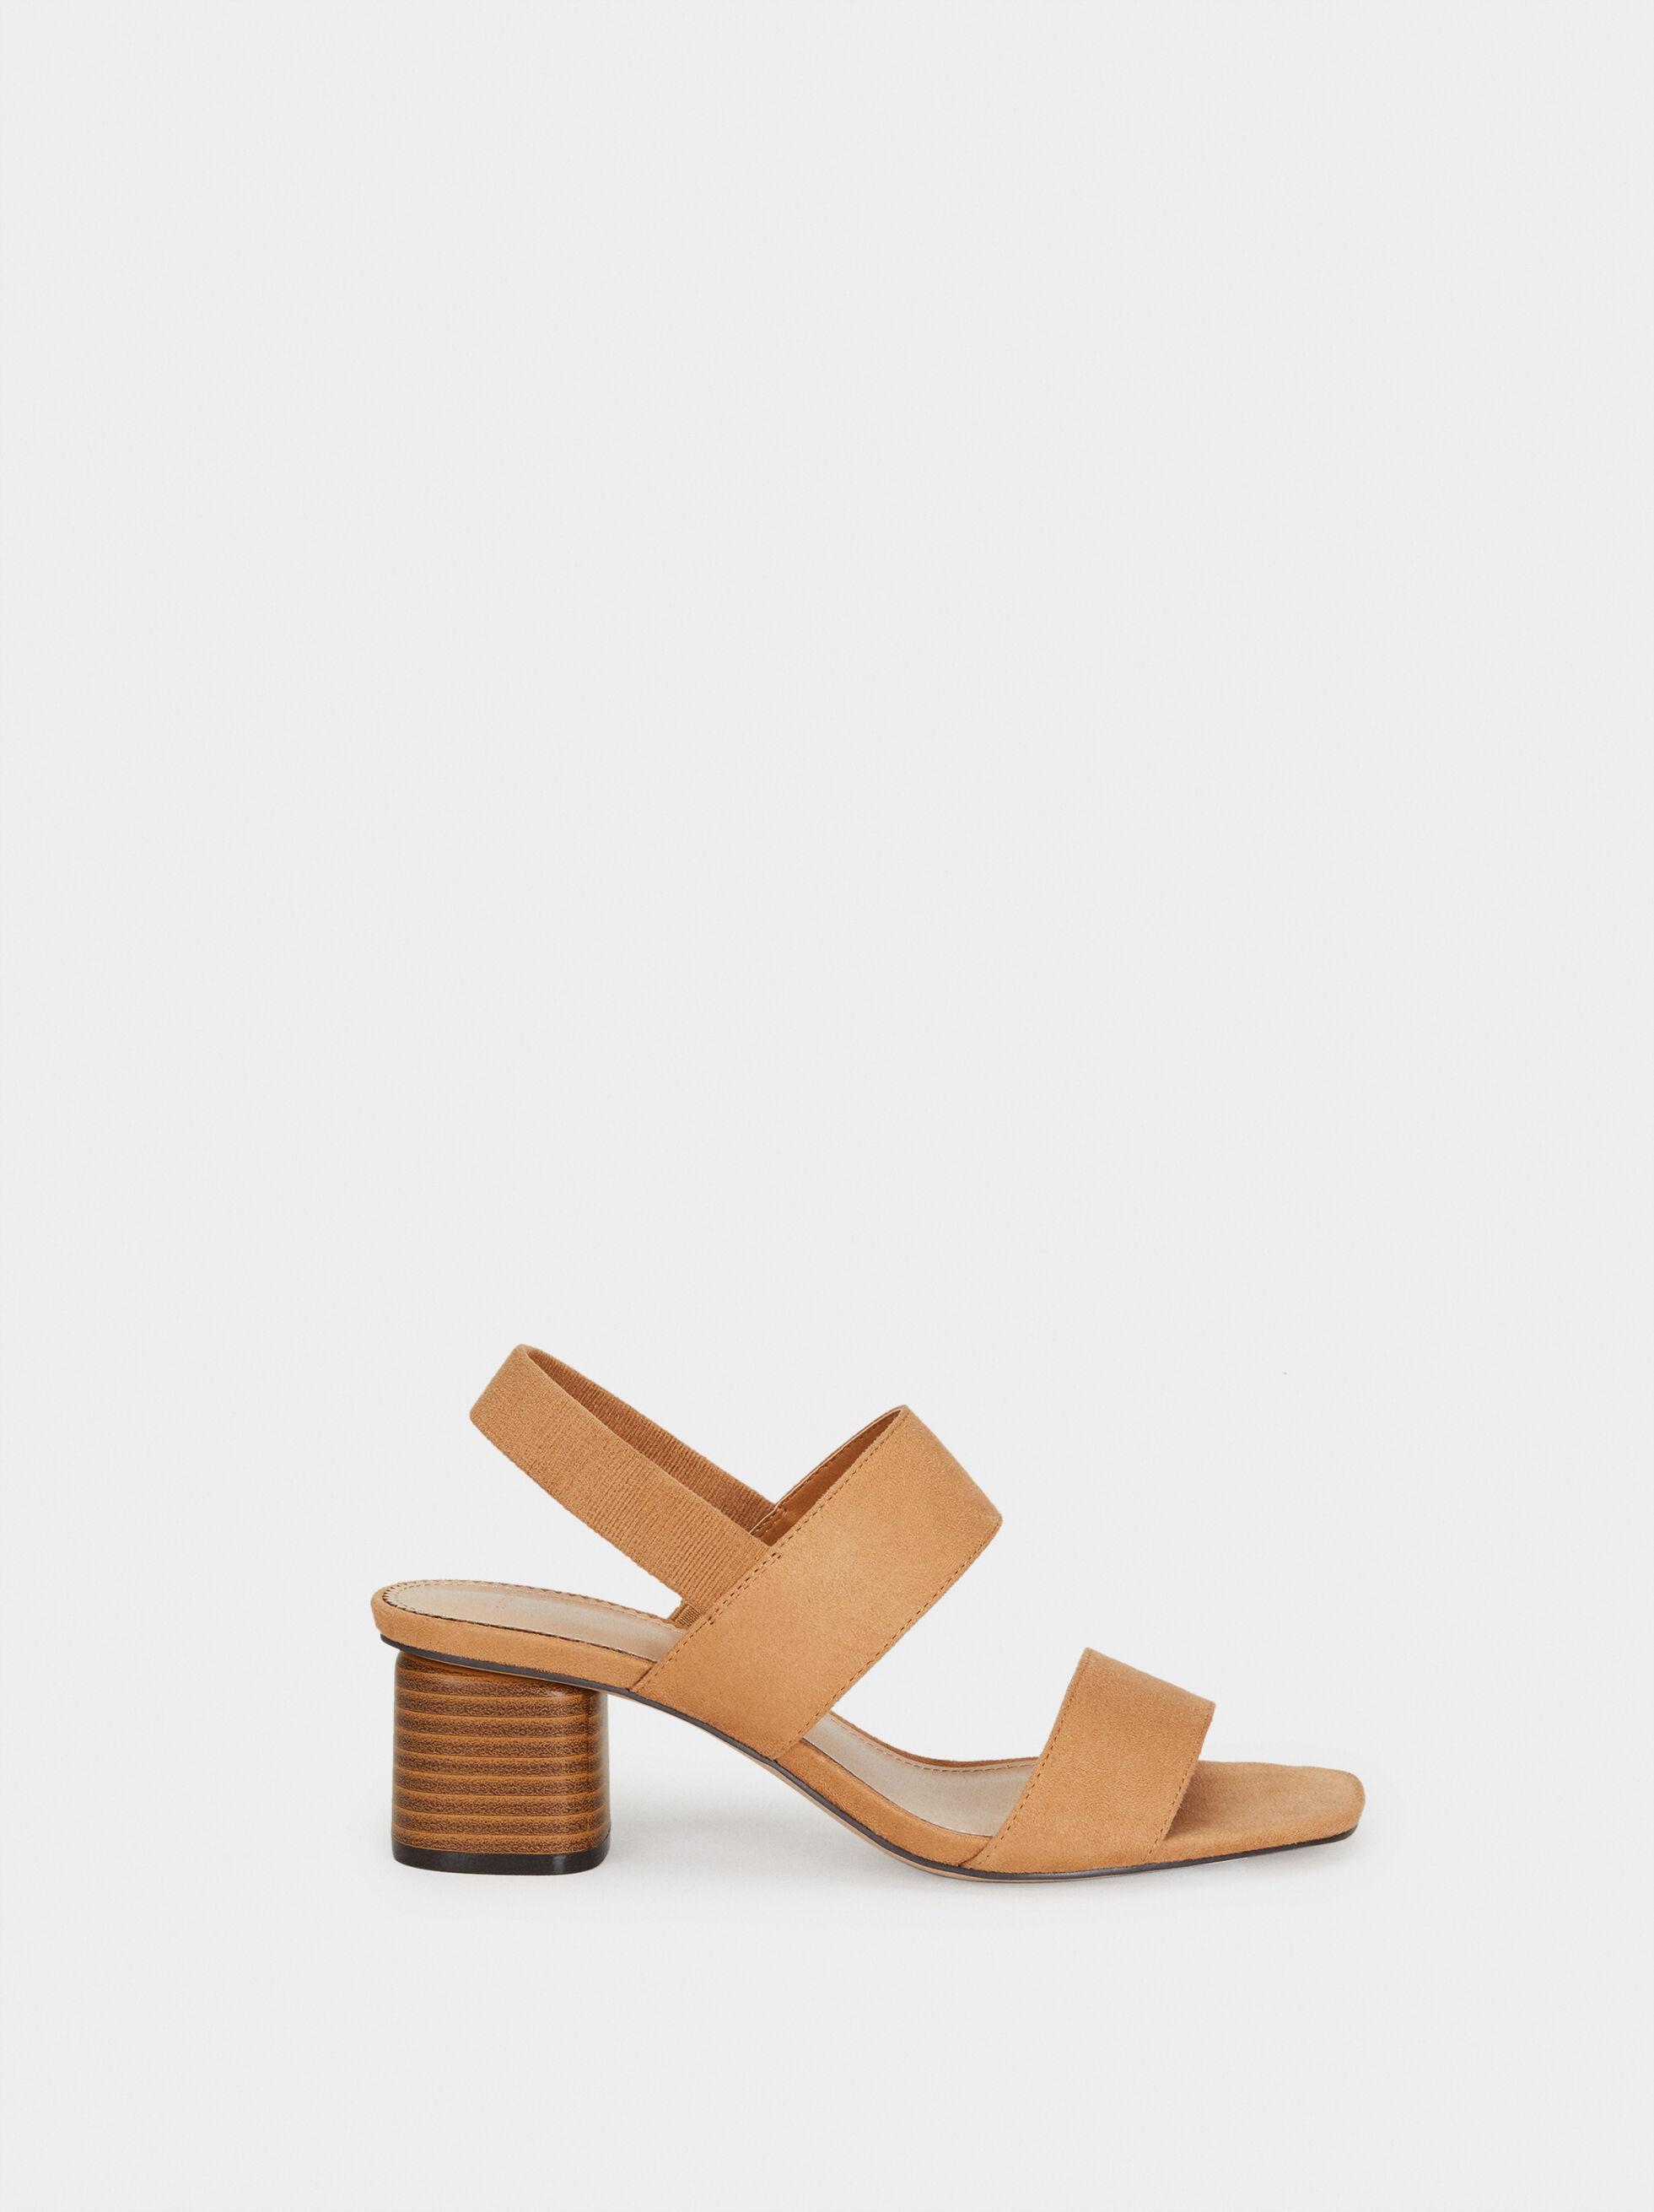 Mid-Heel Sandals With Elasticated